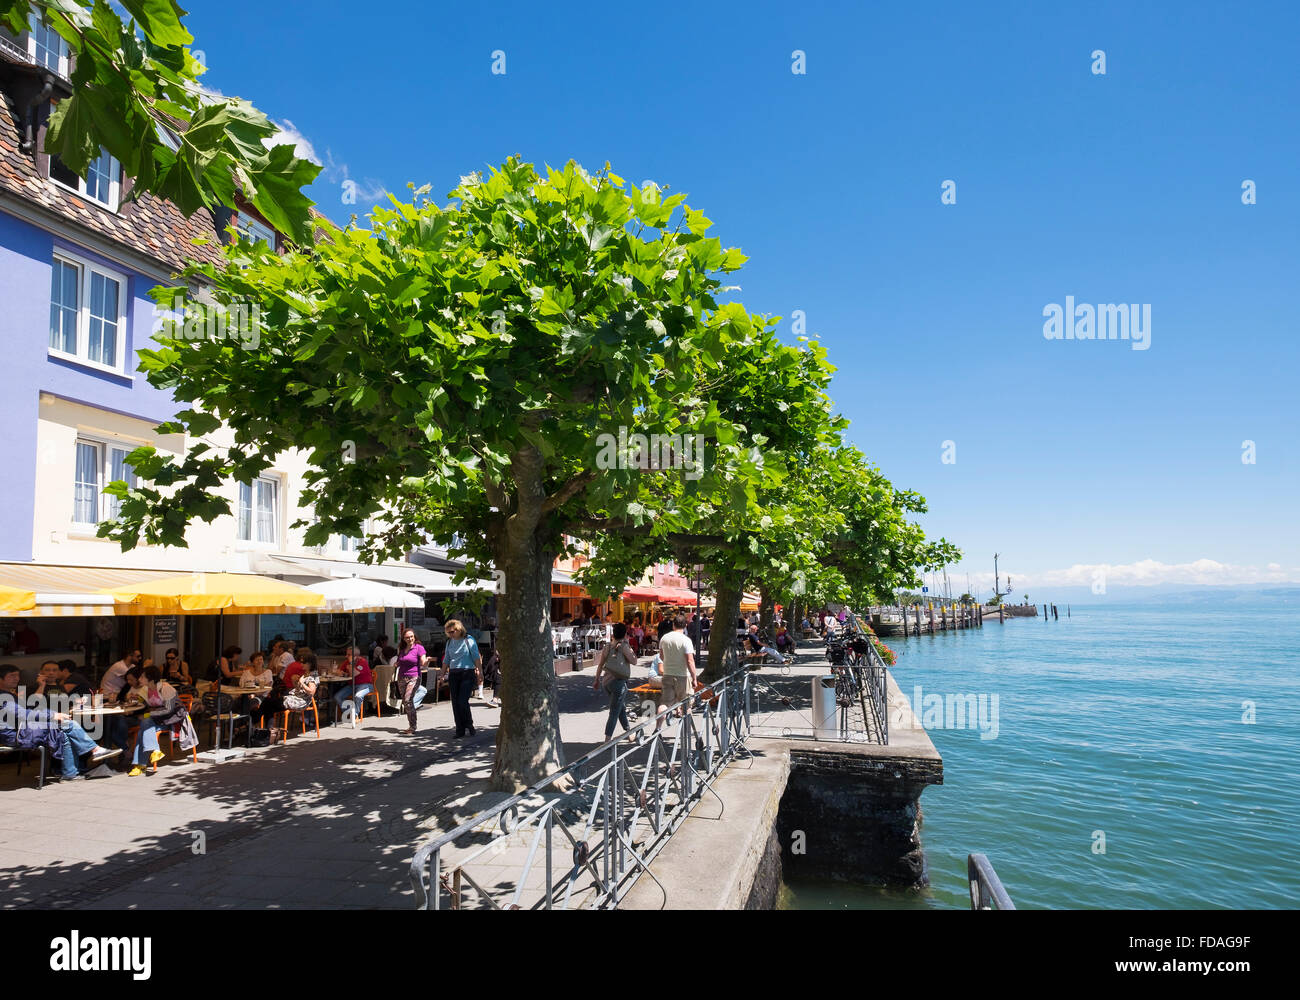 Promenade Meersburg Am Bodensee Bodenseekreis Oberschwaben Baden